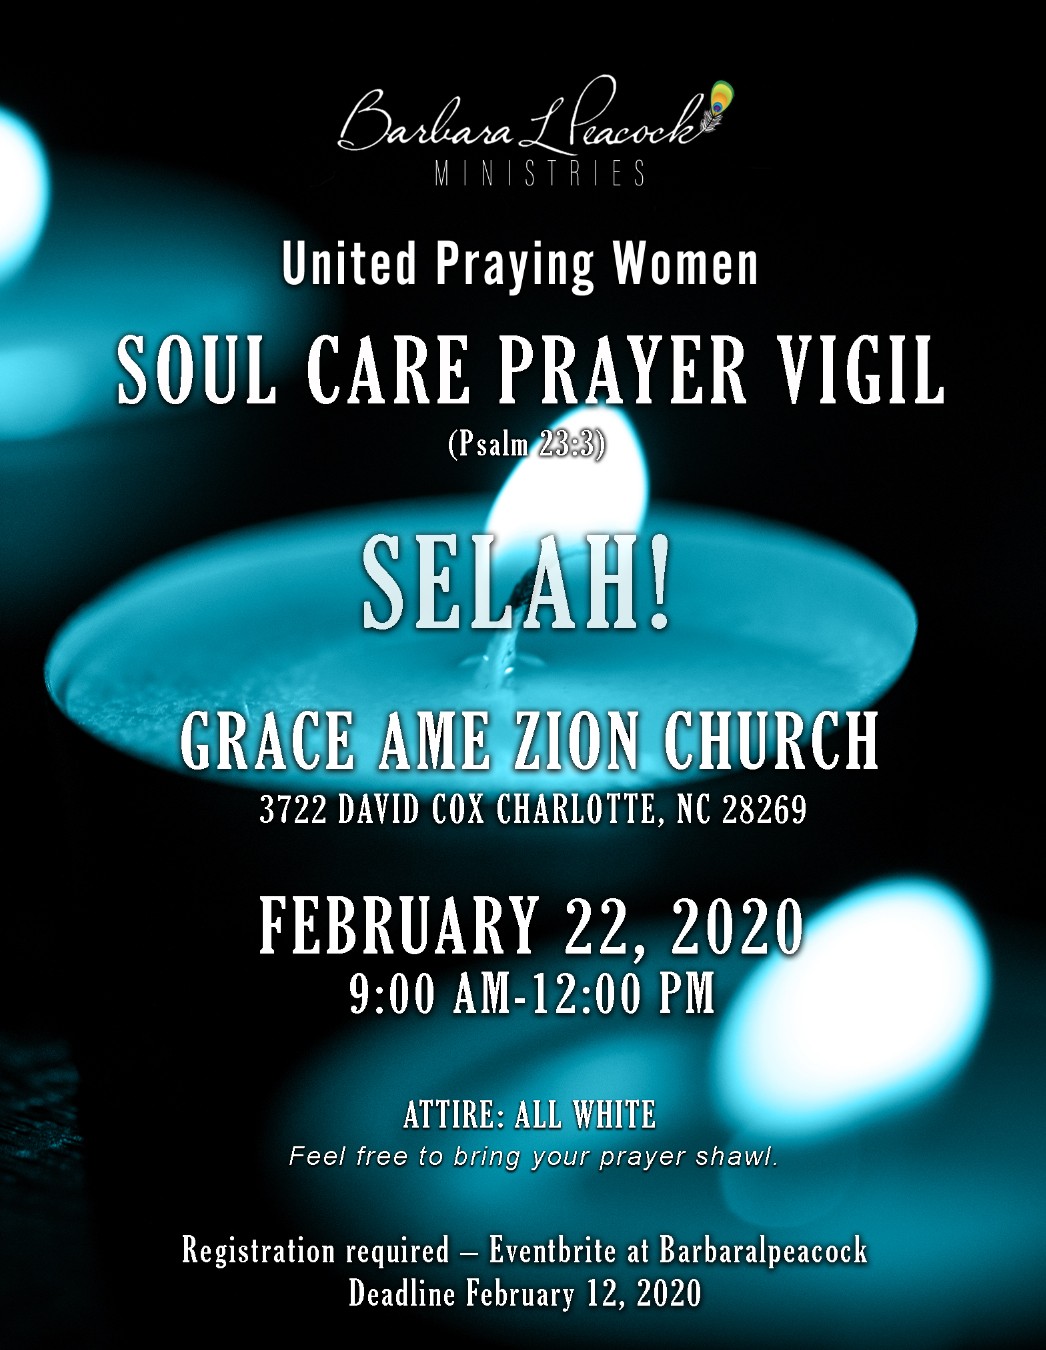 United Praying Women